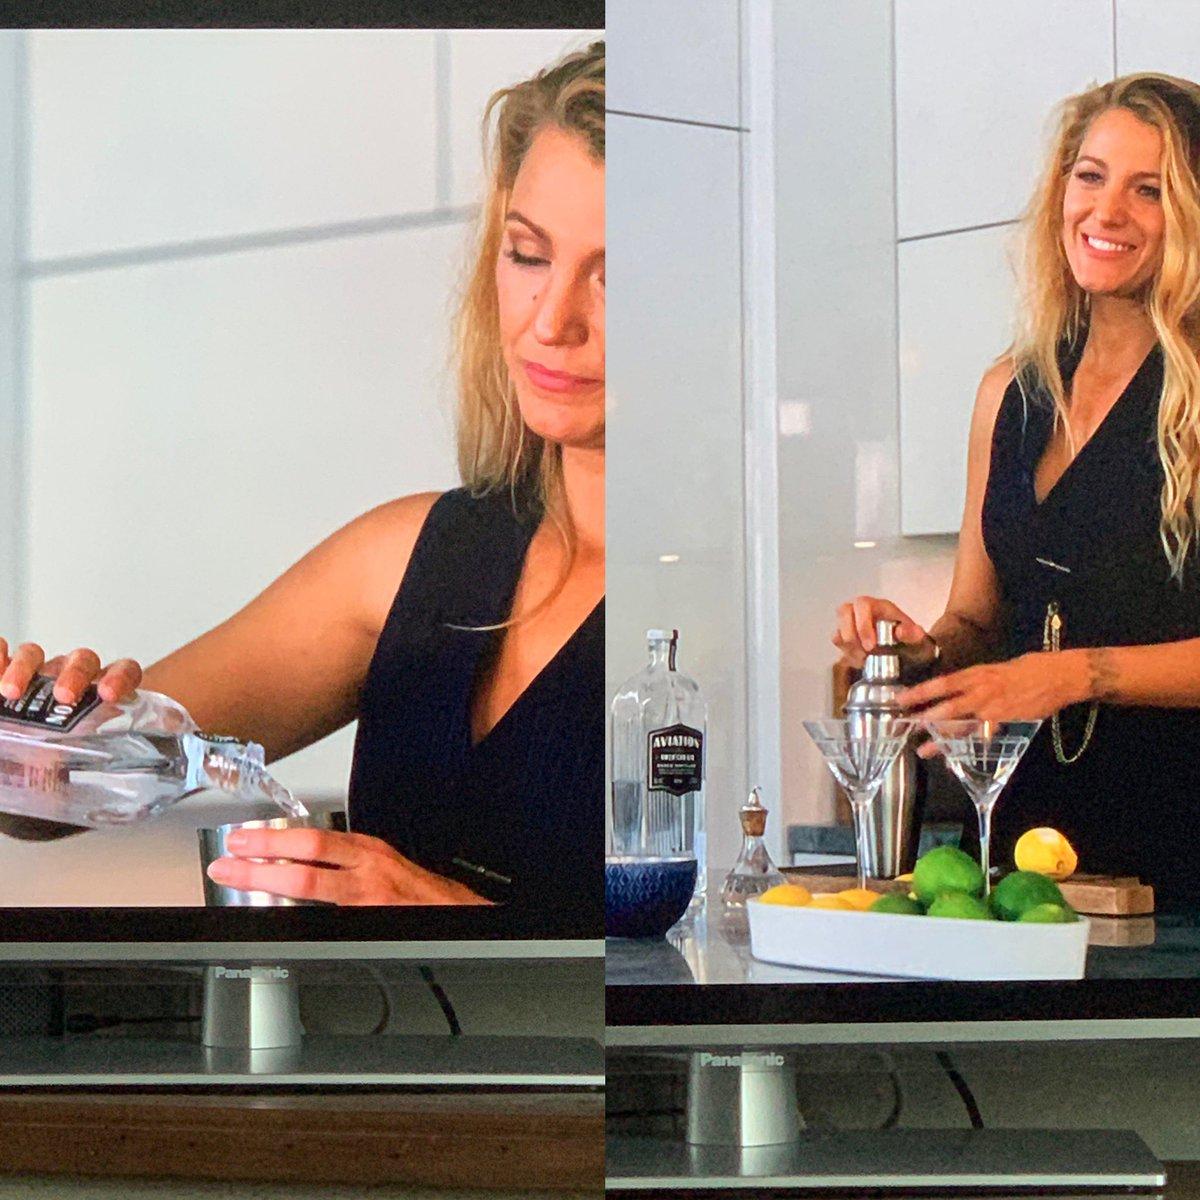 Shaken not stirred @blakelively @AviationGin   Was this filmed in @VancityReynolds family kitchen?  Watching @ASimpleFavor on #@NetflixUK #asimplefavor https://t.co/jRCgXt1rAA